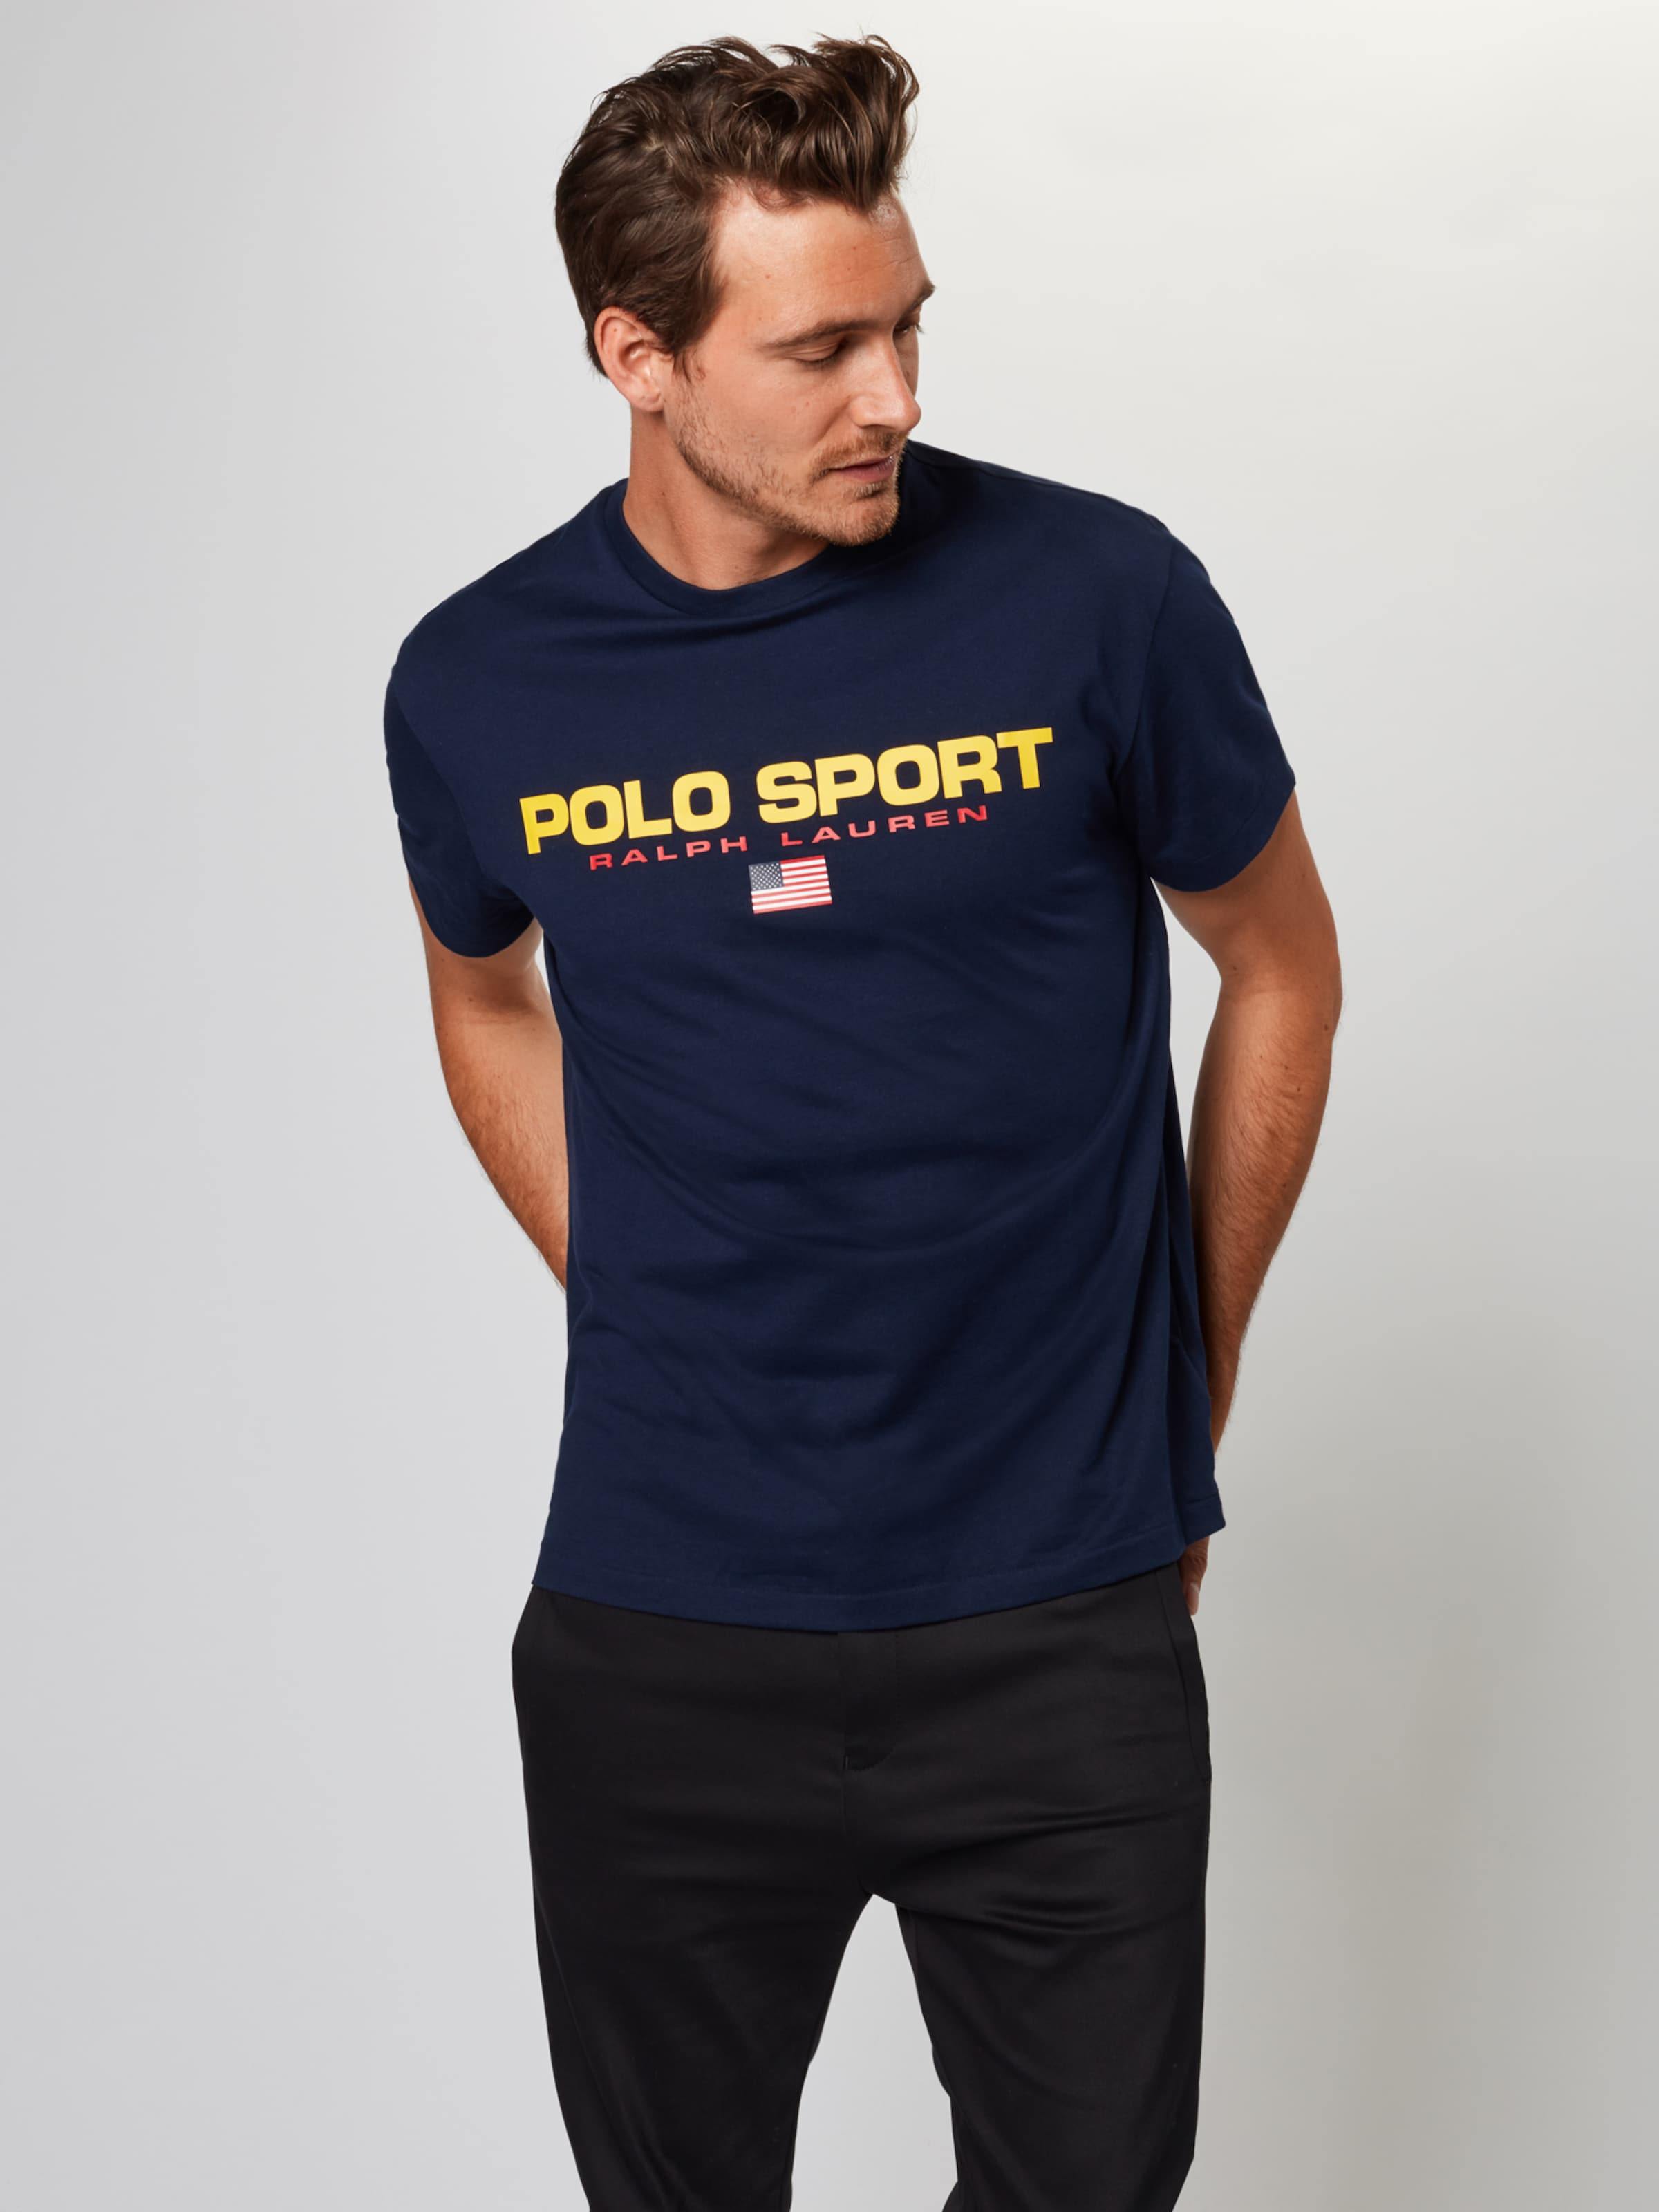 1 In Jersey Ralph Lauren Polo ssl tsh' NavyGelb '26 Shirt kiuZTPXO